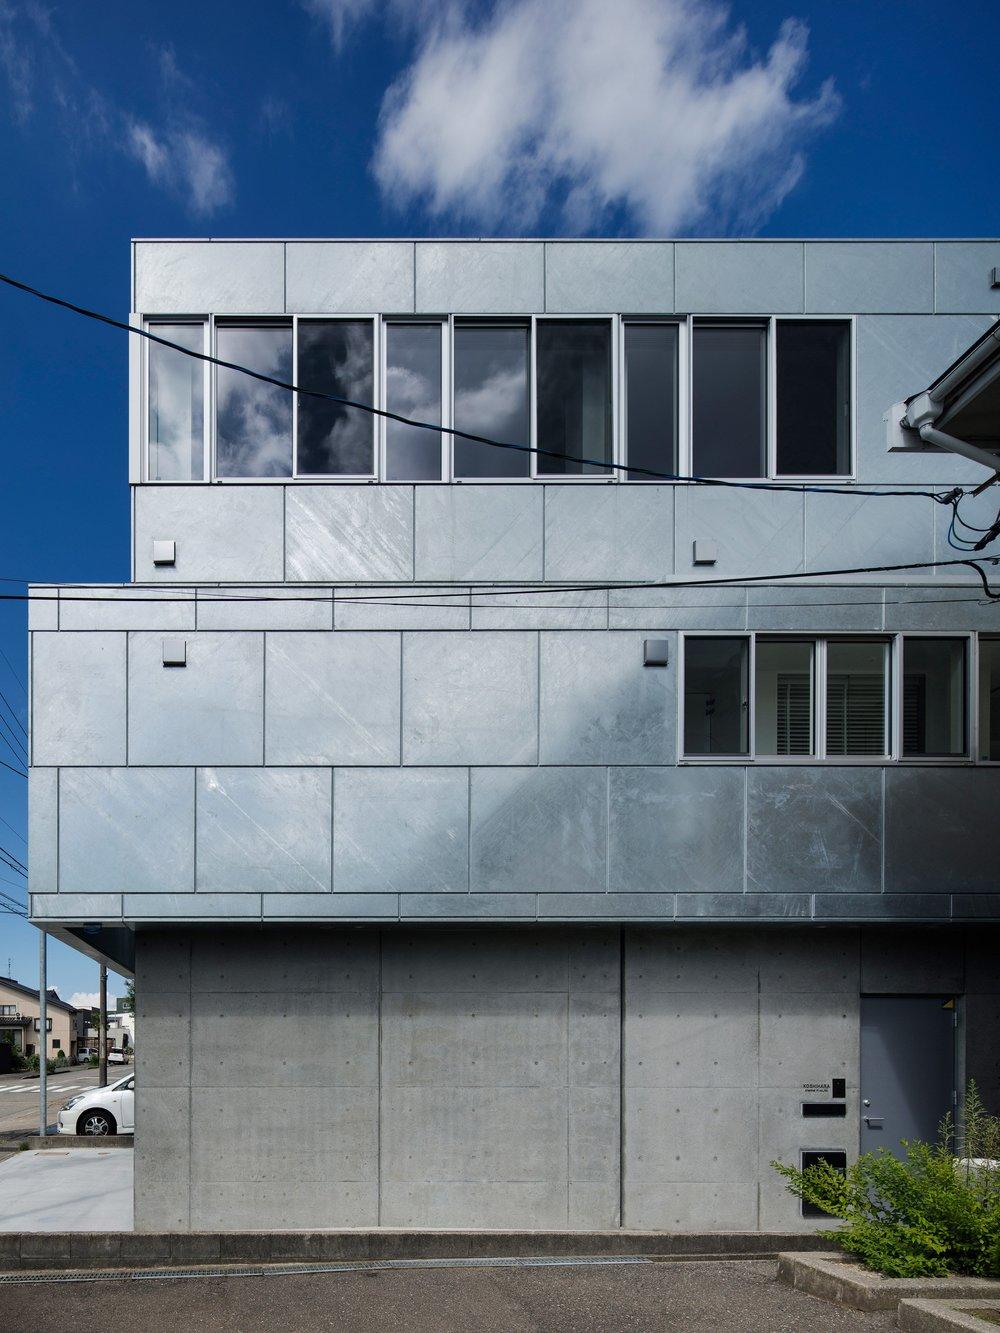 shinbohon-house-k-yuichi-yoshida-associates-architecture-residential-japan-_dezeen_2364_col_0.jpg